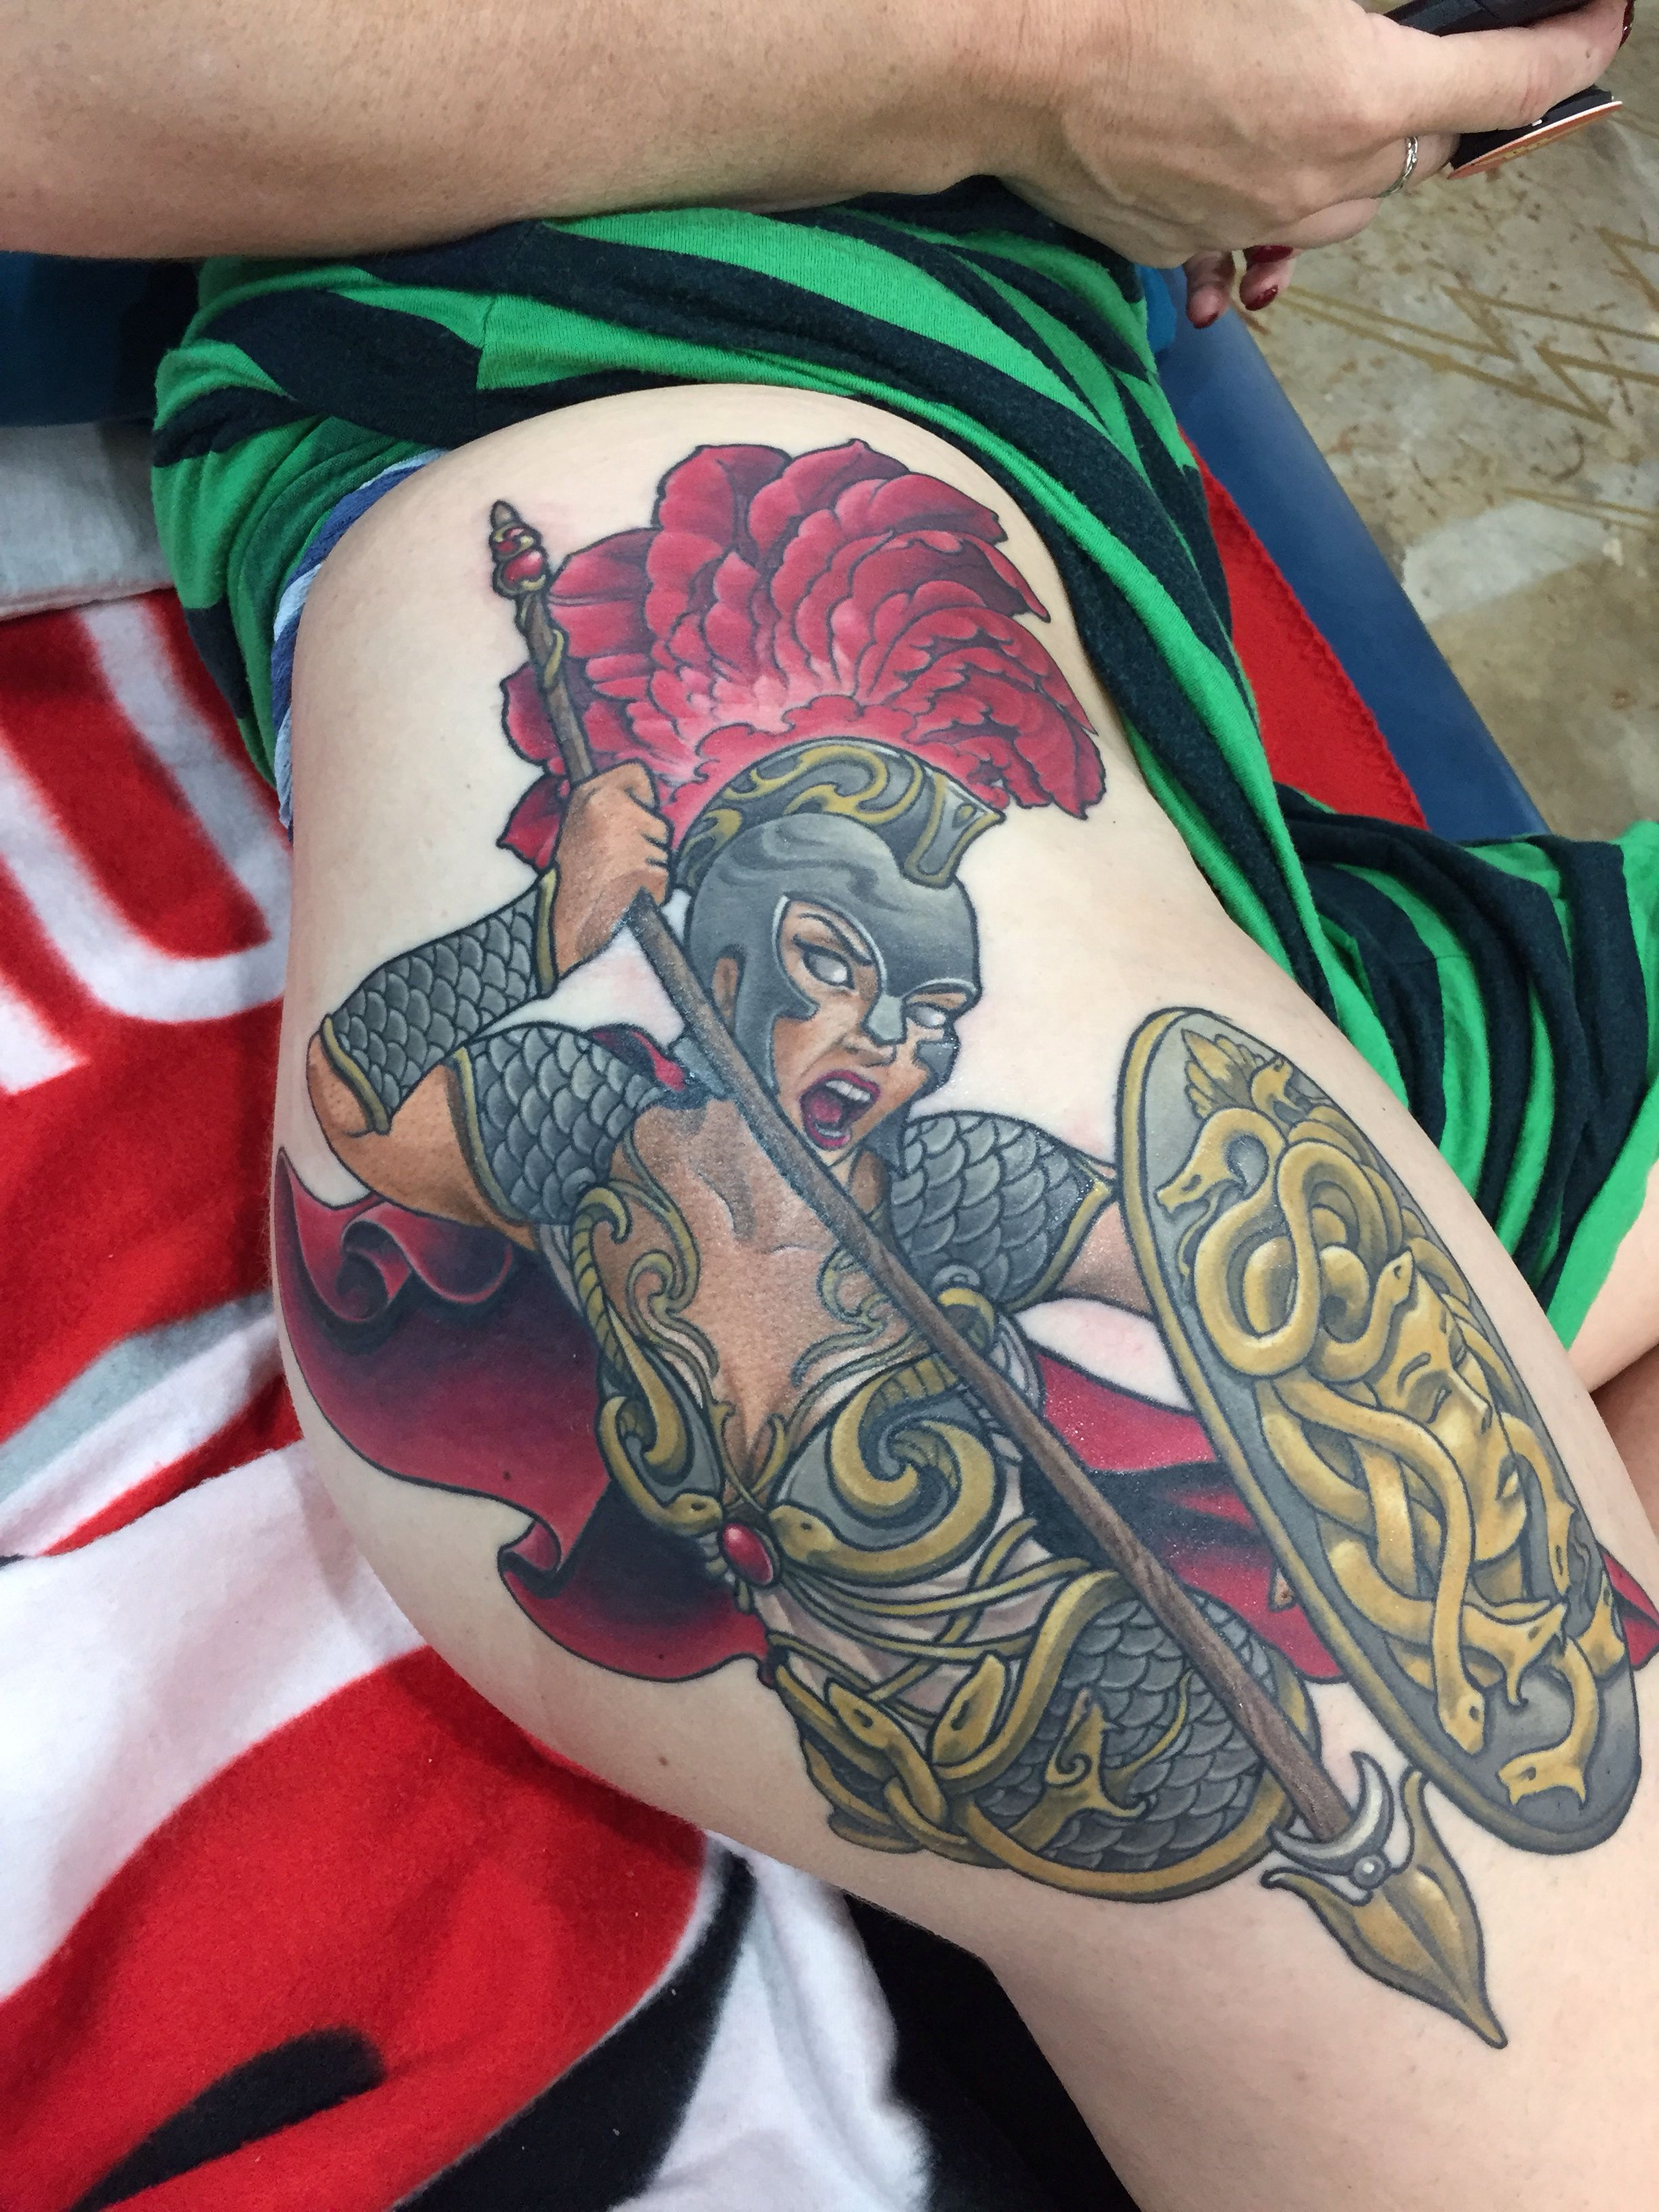 Athena tattoo by candice tekus at triple moon tattoo